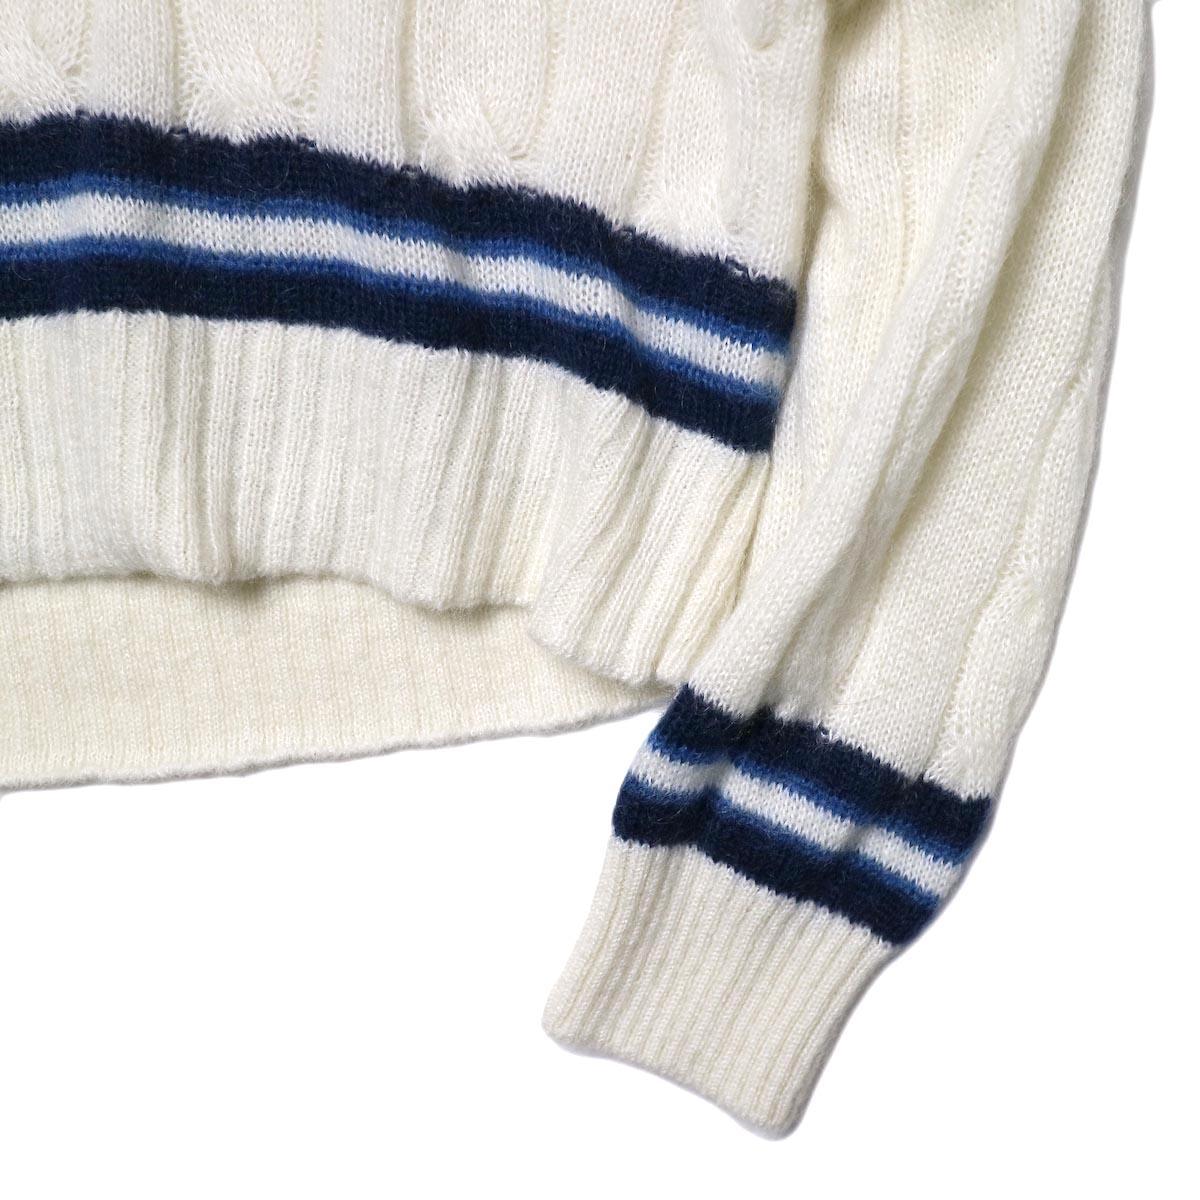 JANE SMITH / 5G BIG CABLE TILDEN V-NECK KINT (off white) 袖・裾